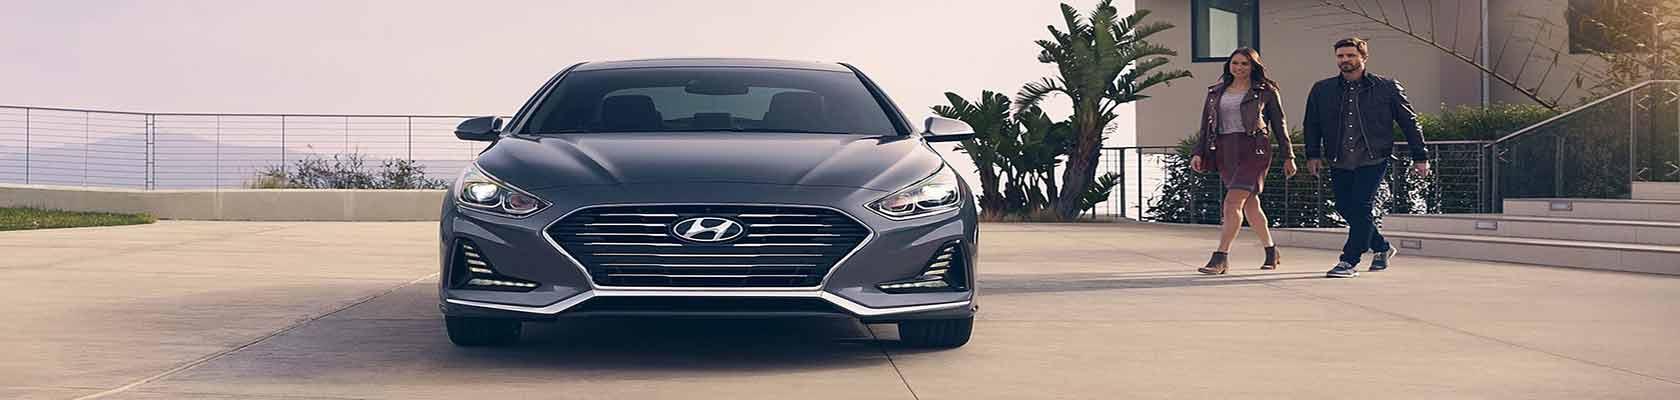 Online Hyundai Car Spare Parts Dealer Dubai Max Speed